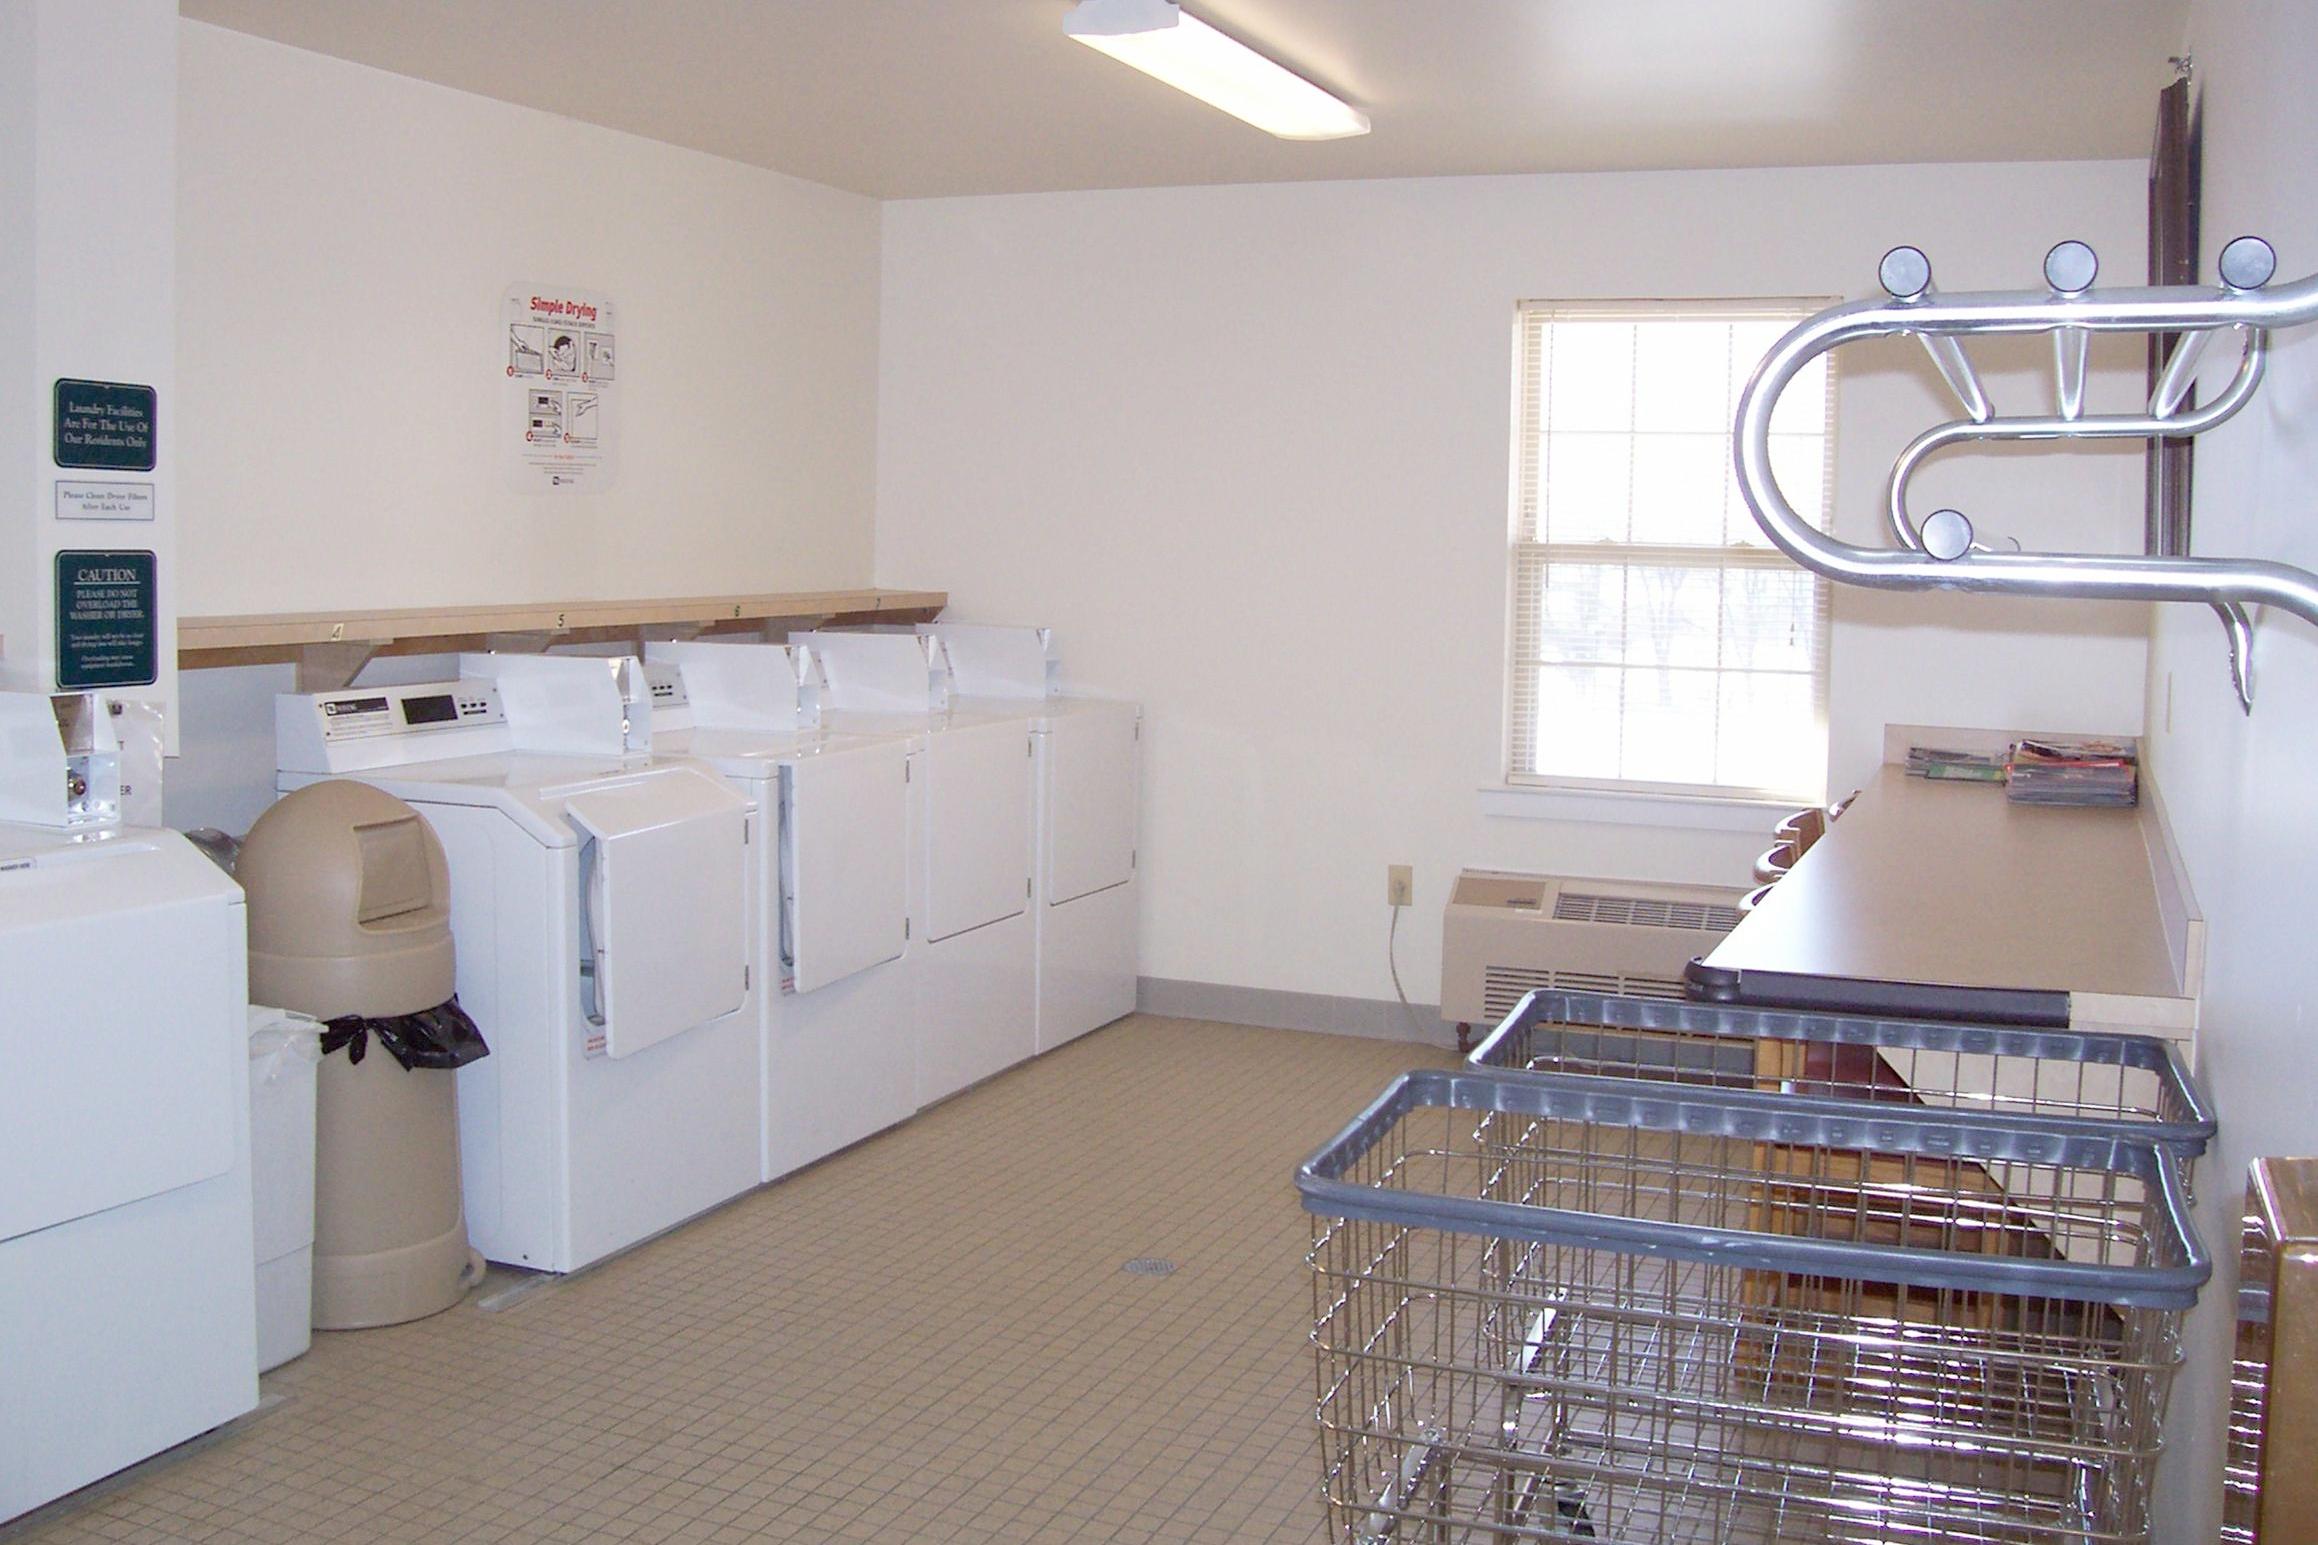 11-Ahepa 60 Laundry 2.jpg